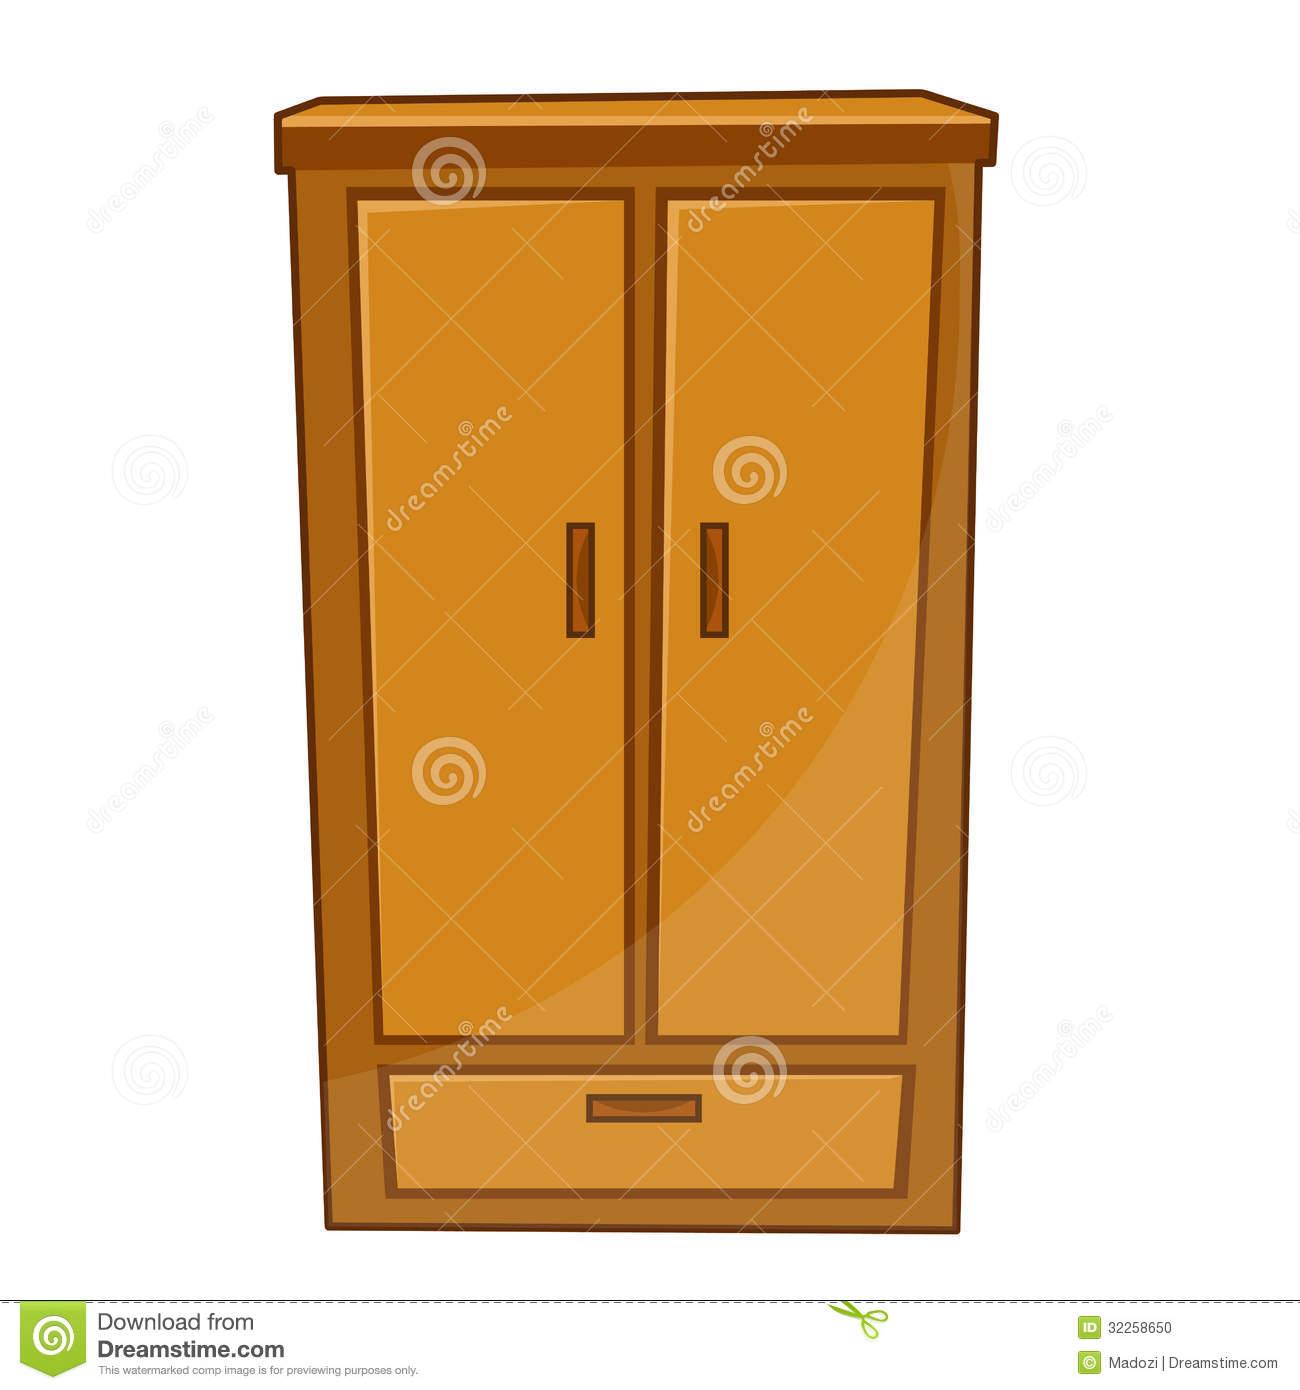 Wardobe clipart graphic freeuse stock Wardrobe clipart 9 » Clipart Station graphic freeuse stock